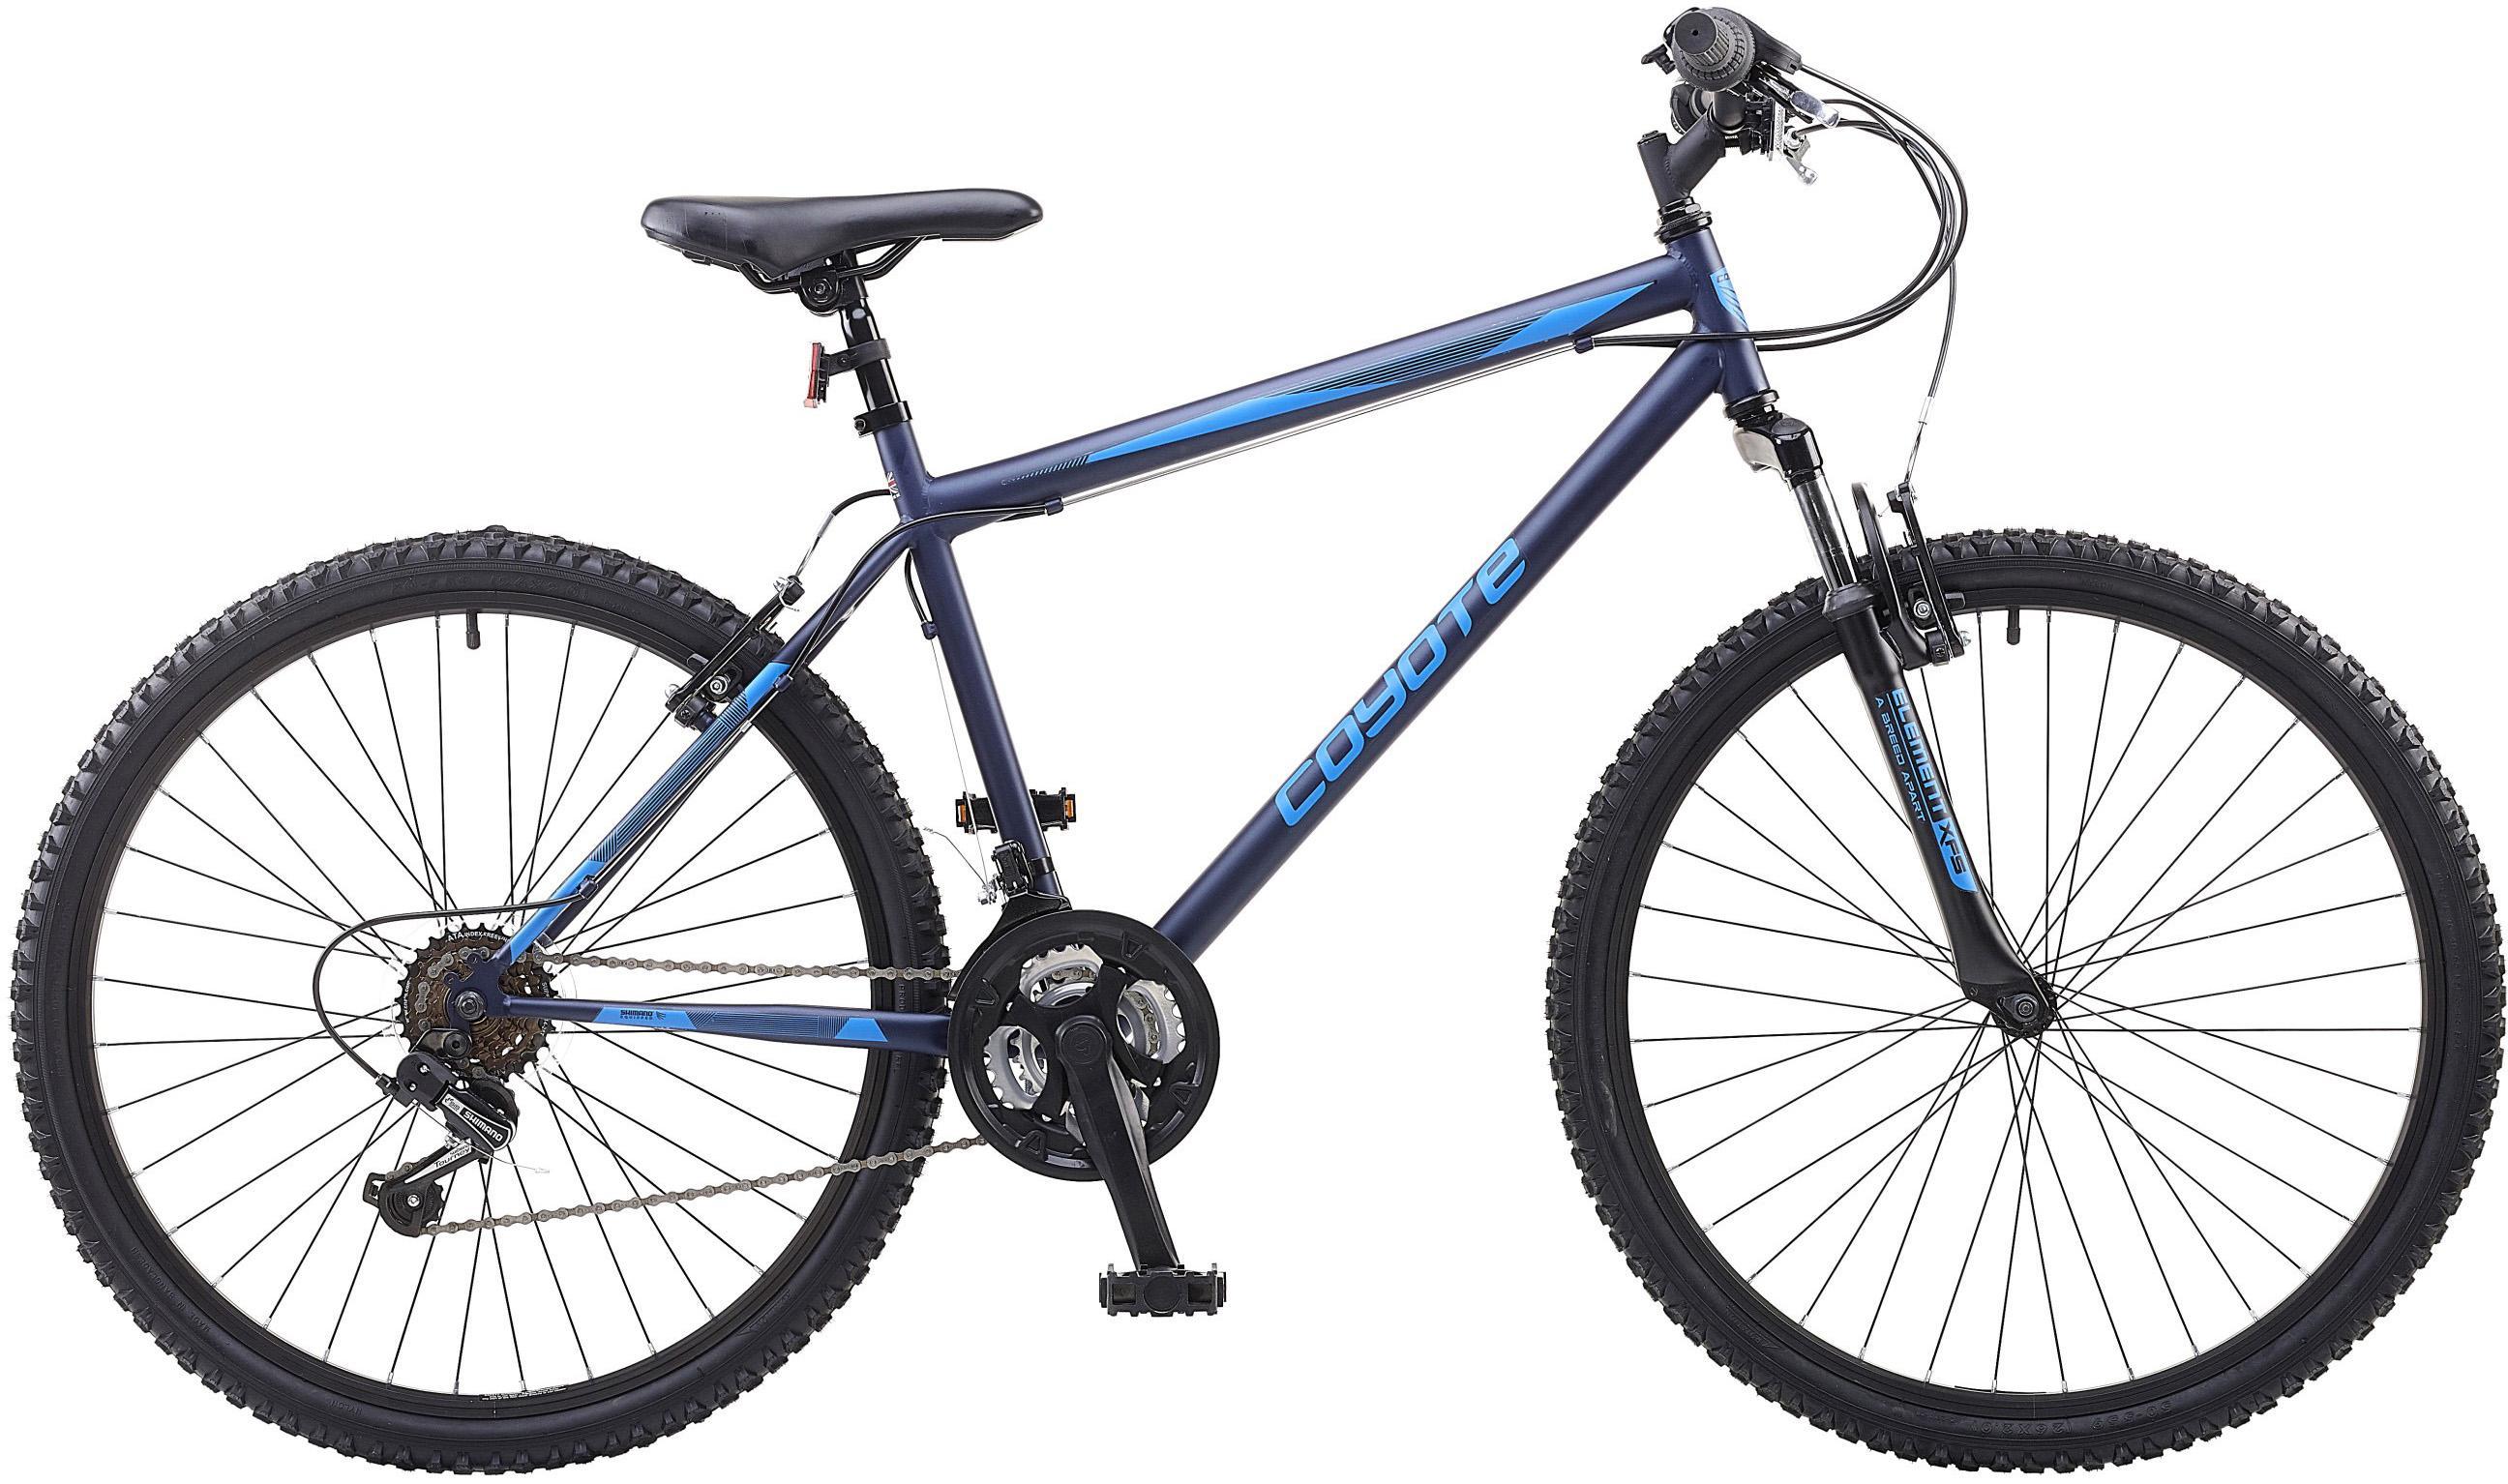 Coyote Element Xfs Mens Mountain Bike - 14 Inch